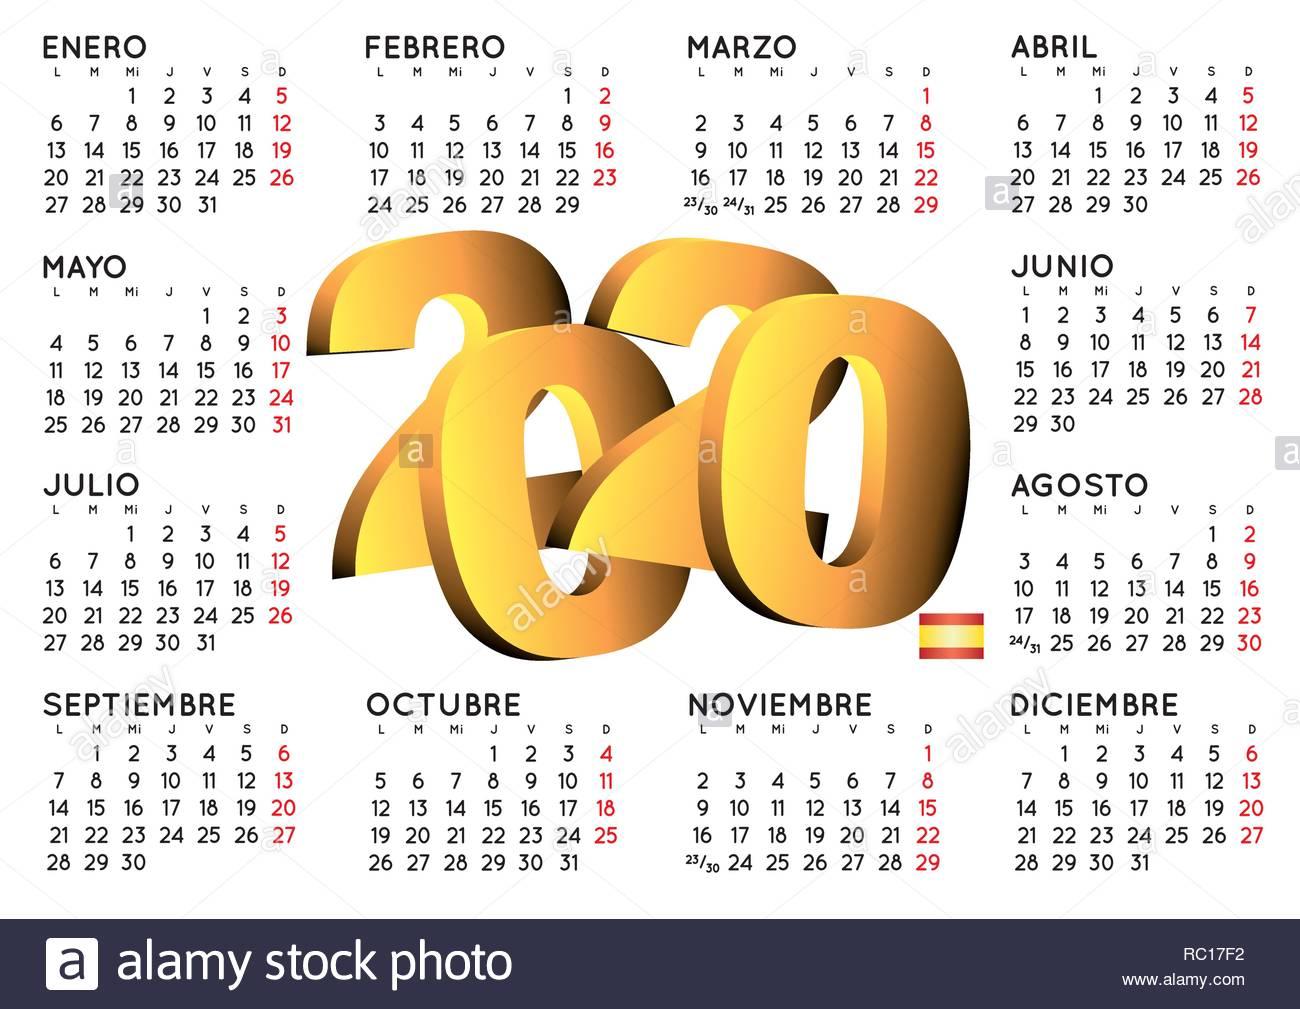 Calendario Di Agosto 2020.2020 Calendario Elegante In Spagnolo Anno Di Calendario